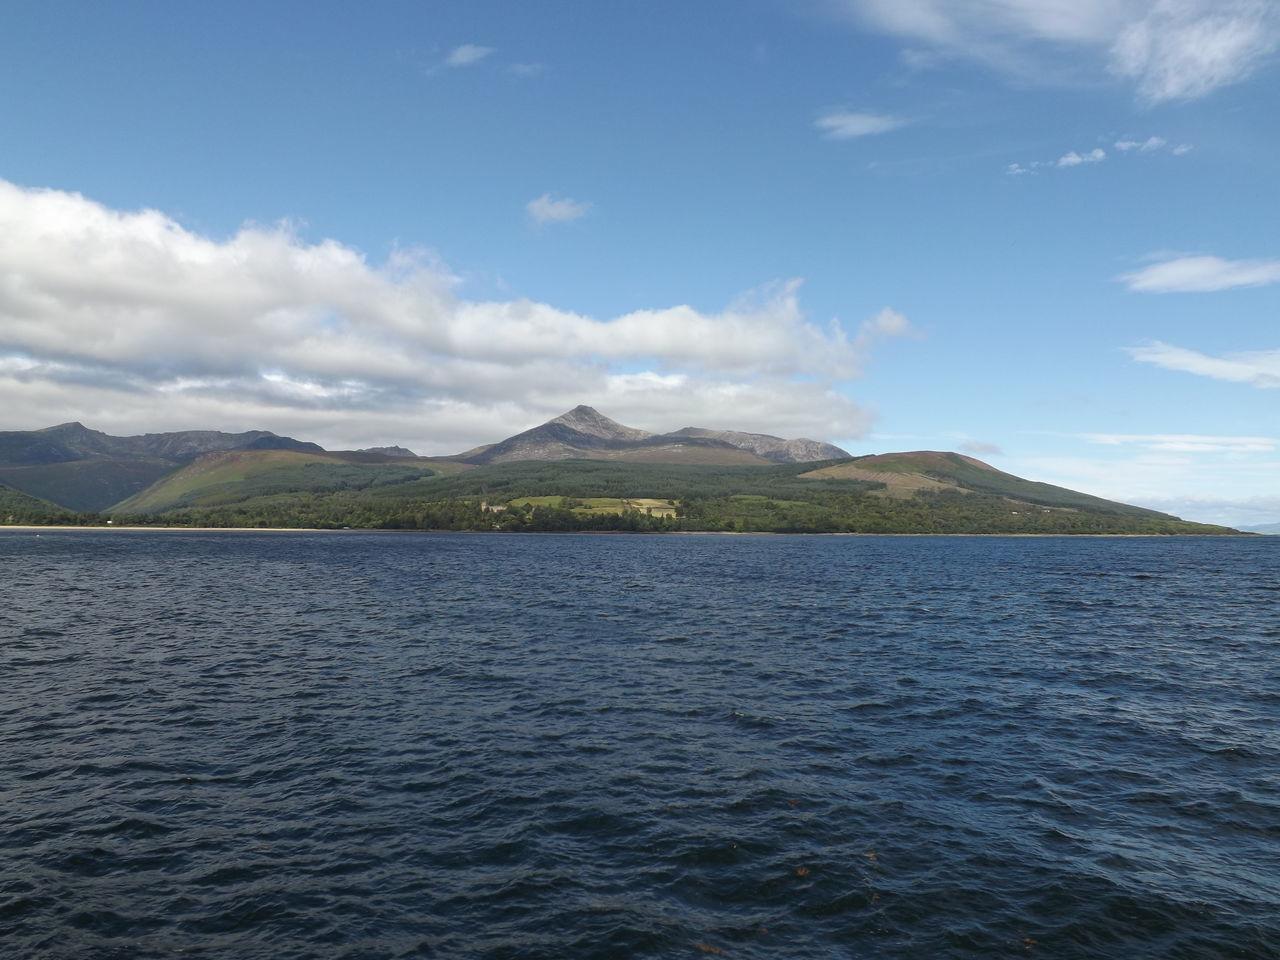 Beauty In Nature Blue Sea Blue Sky Cloud - Sky Day Isle Isle Of Arran  Landscape Mountain Mountain Range No People Outdoors Scenics Scotland Sky Trip Trippy Water